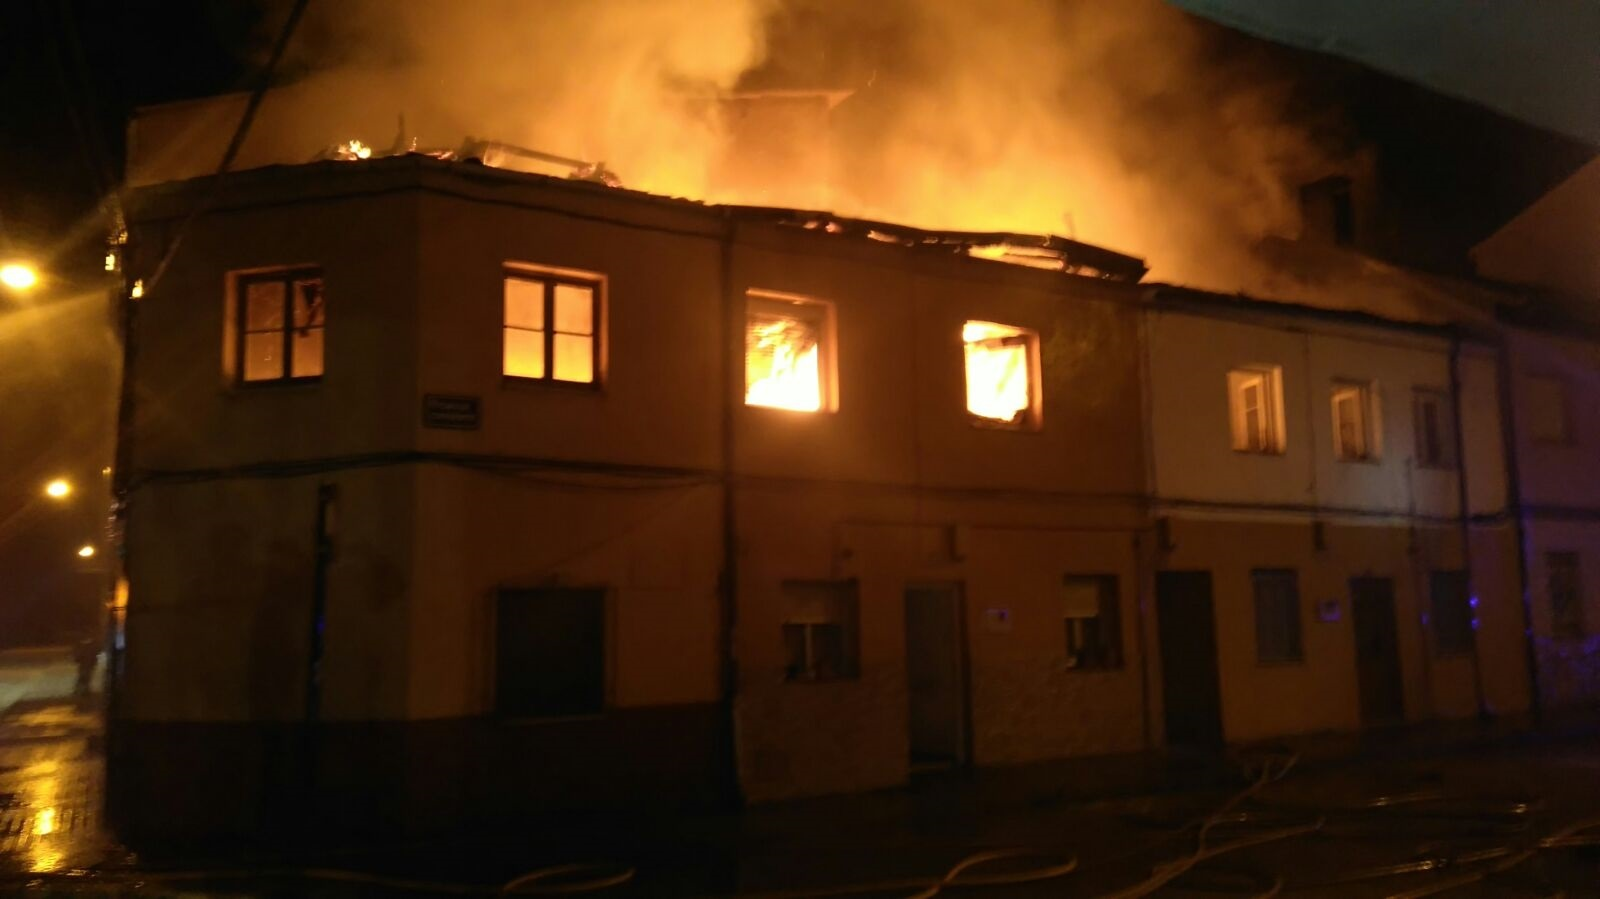 incendio 8abril2018 01